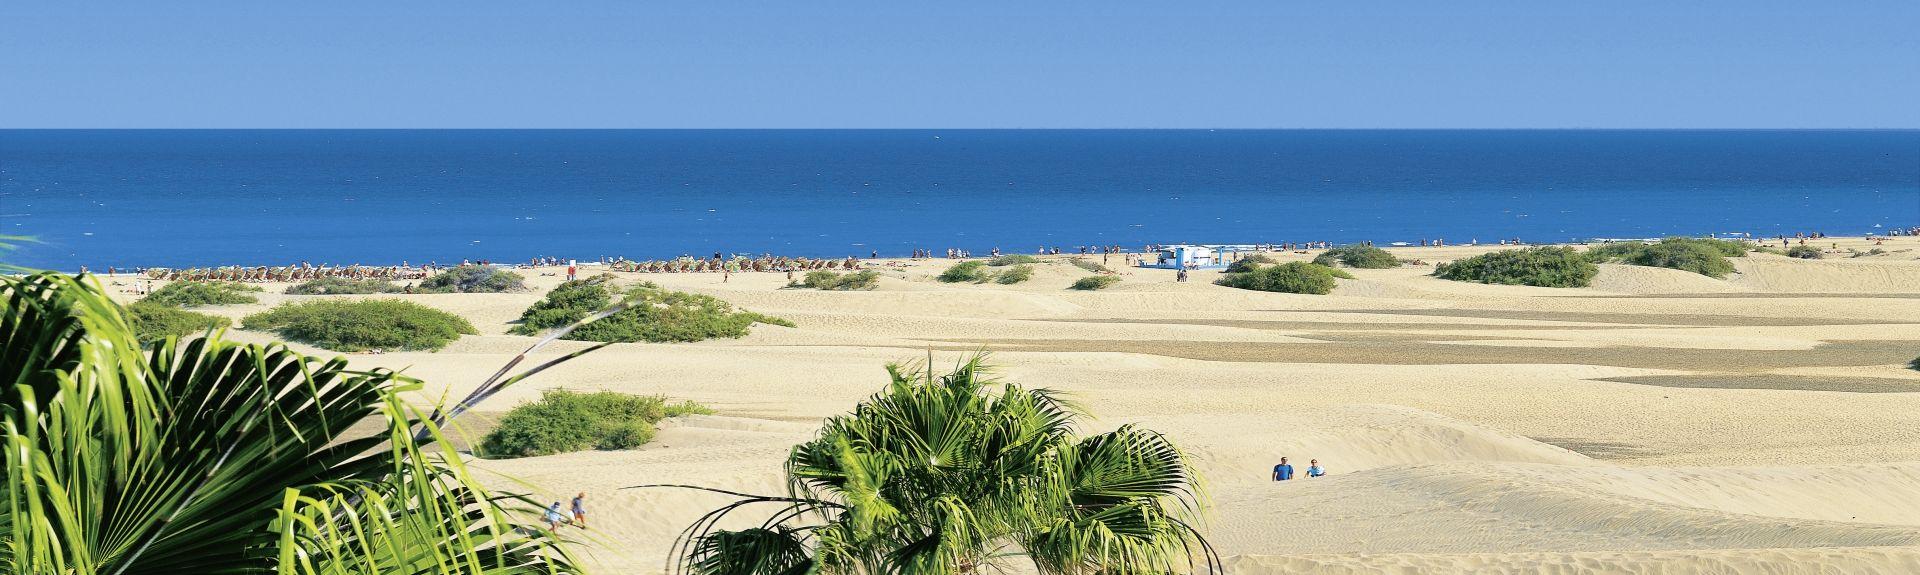 Puerto Rico Beach, Mogan, Spain